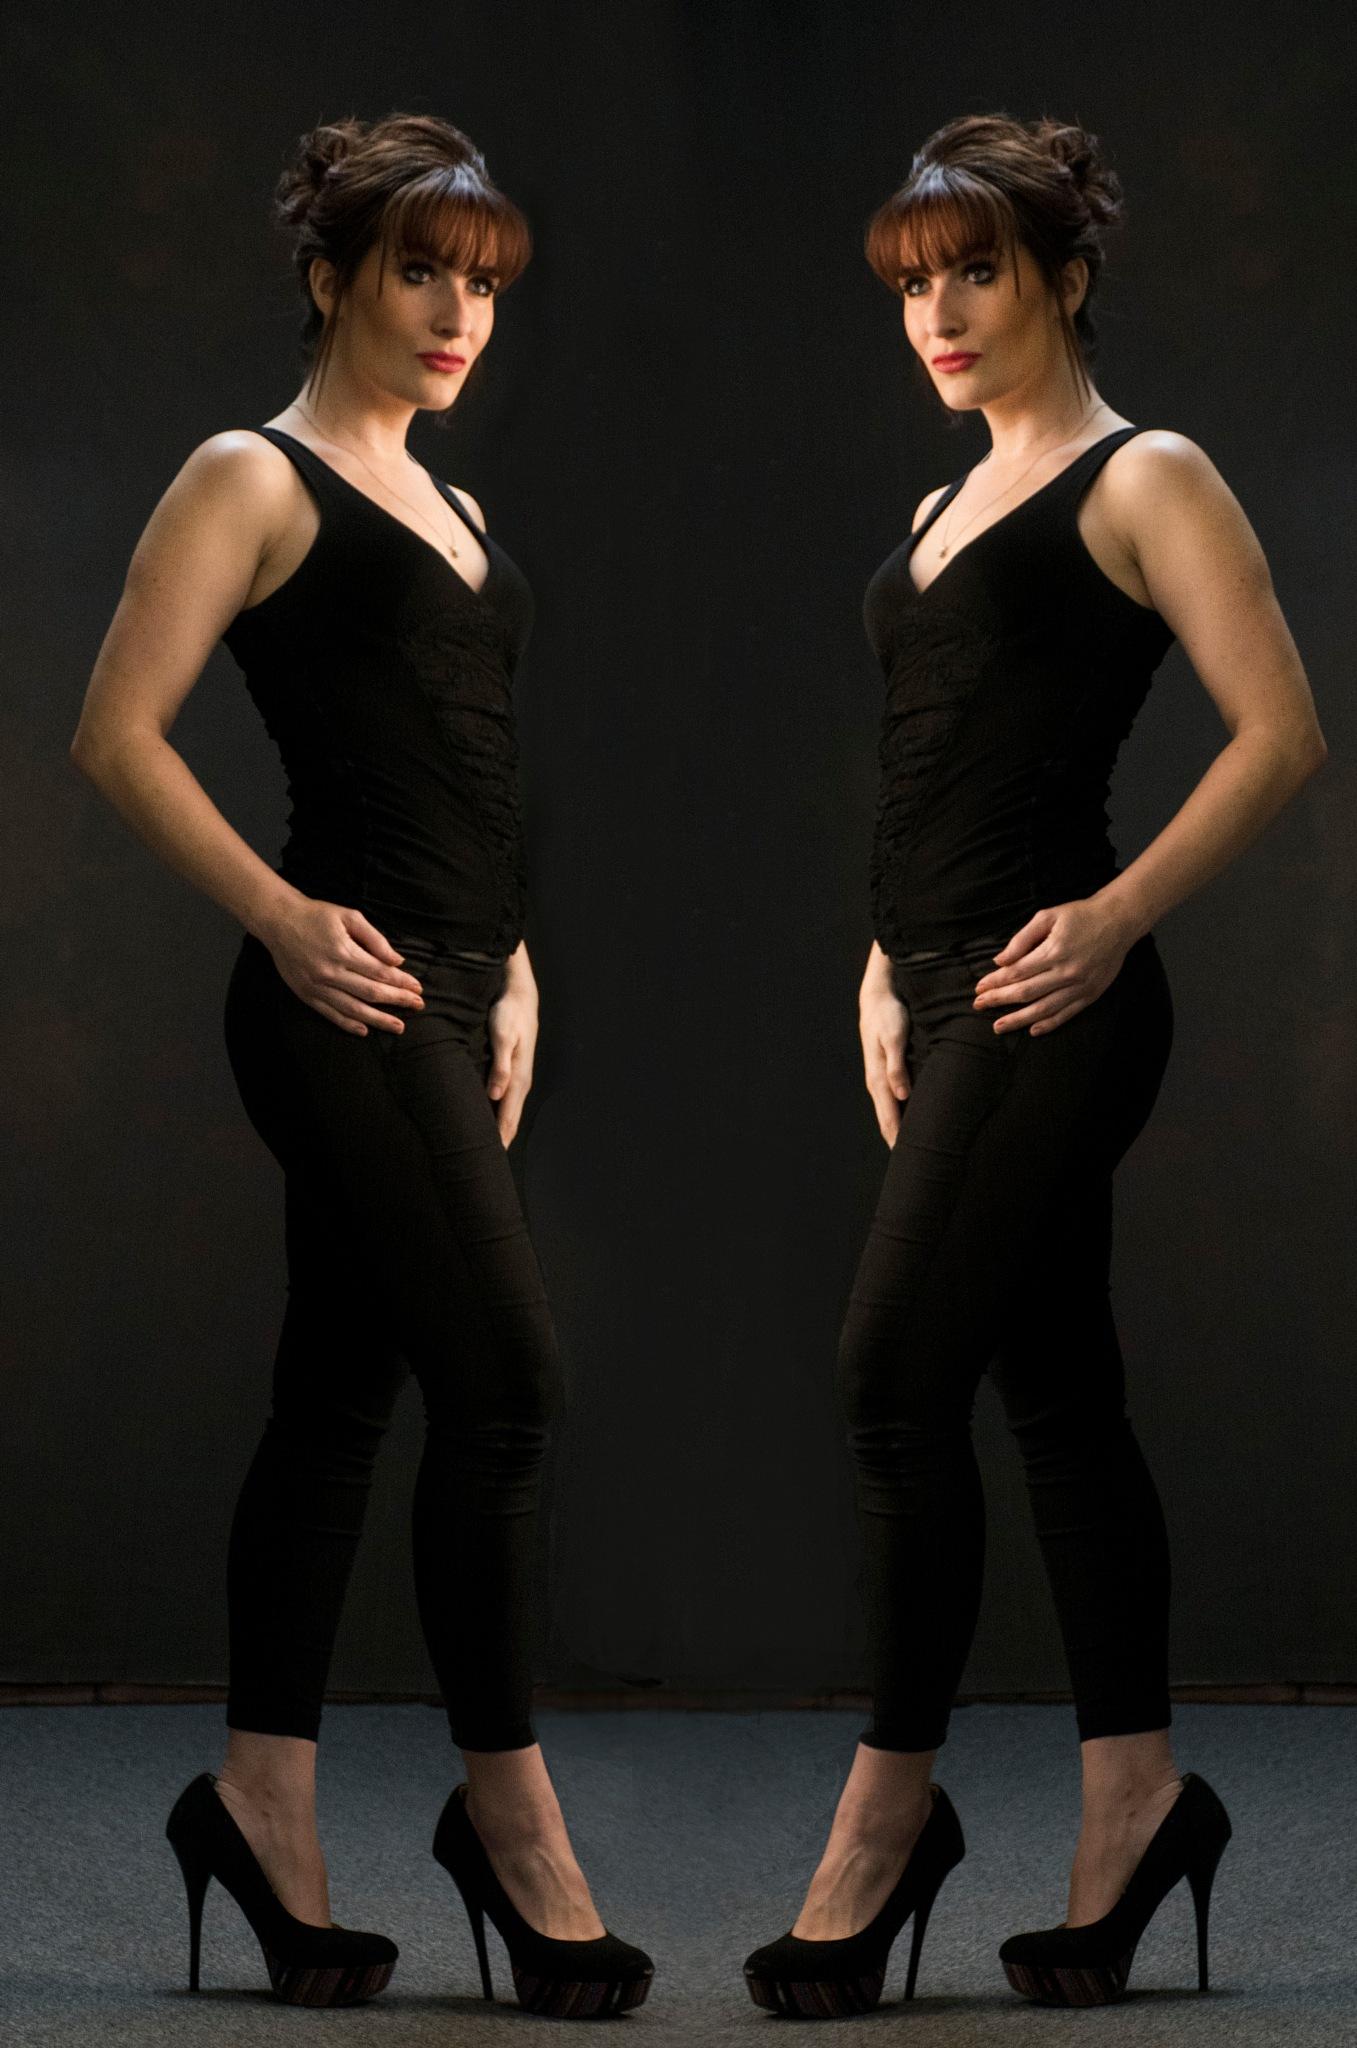 Seeing Double by julie.farrellclark